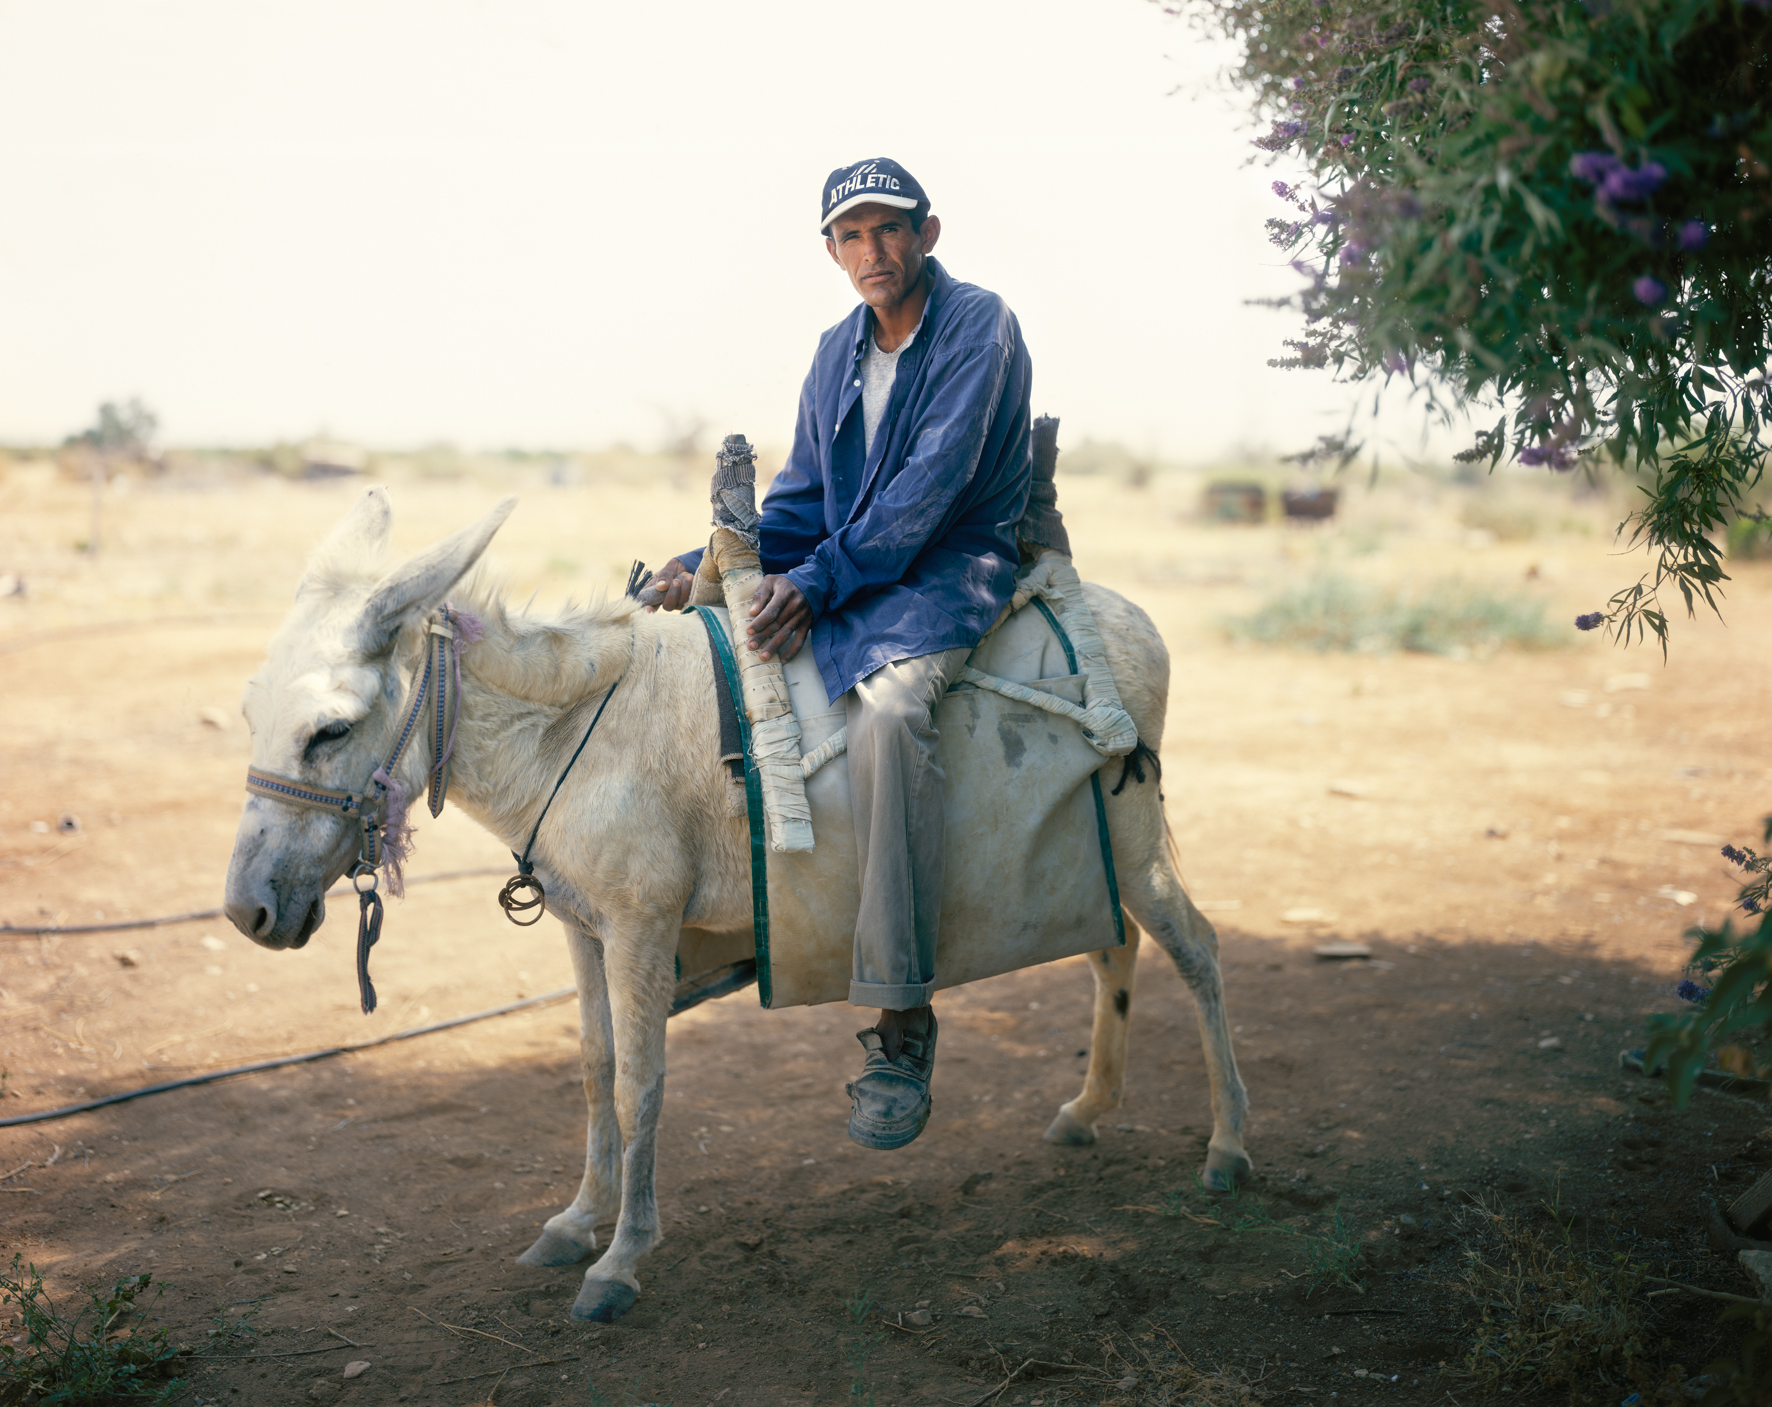 The Man on the White Donkey, HaBiqah, 2006. © Yaakov Israel